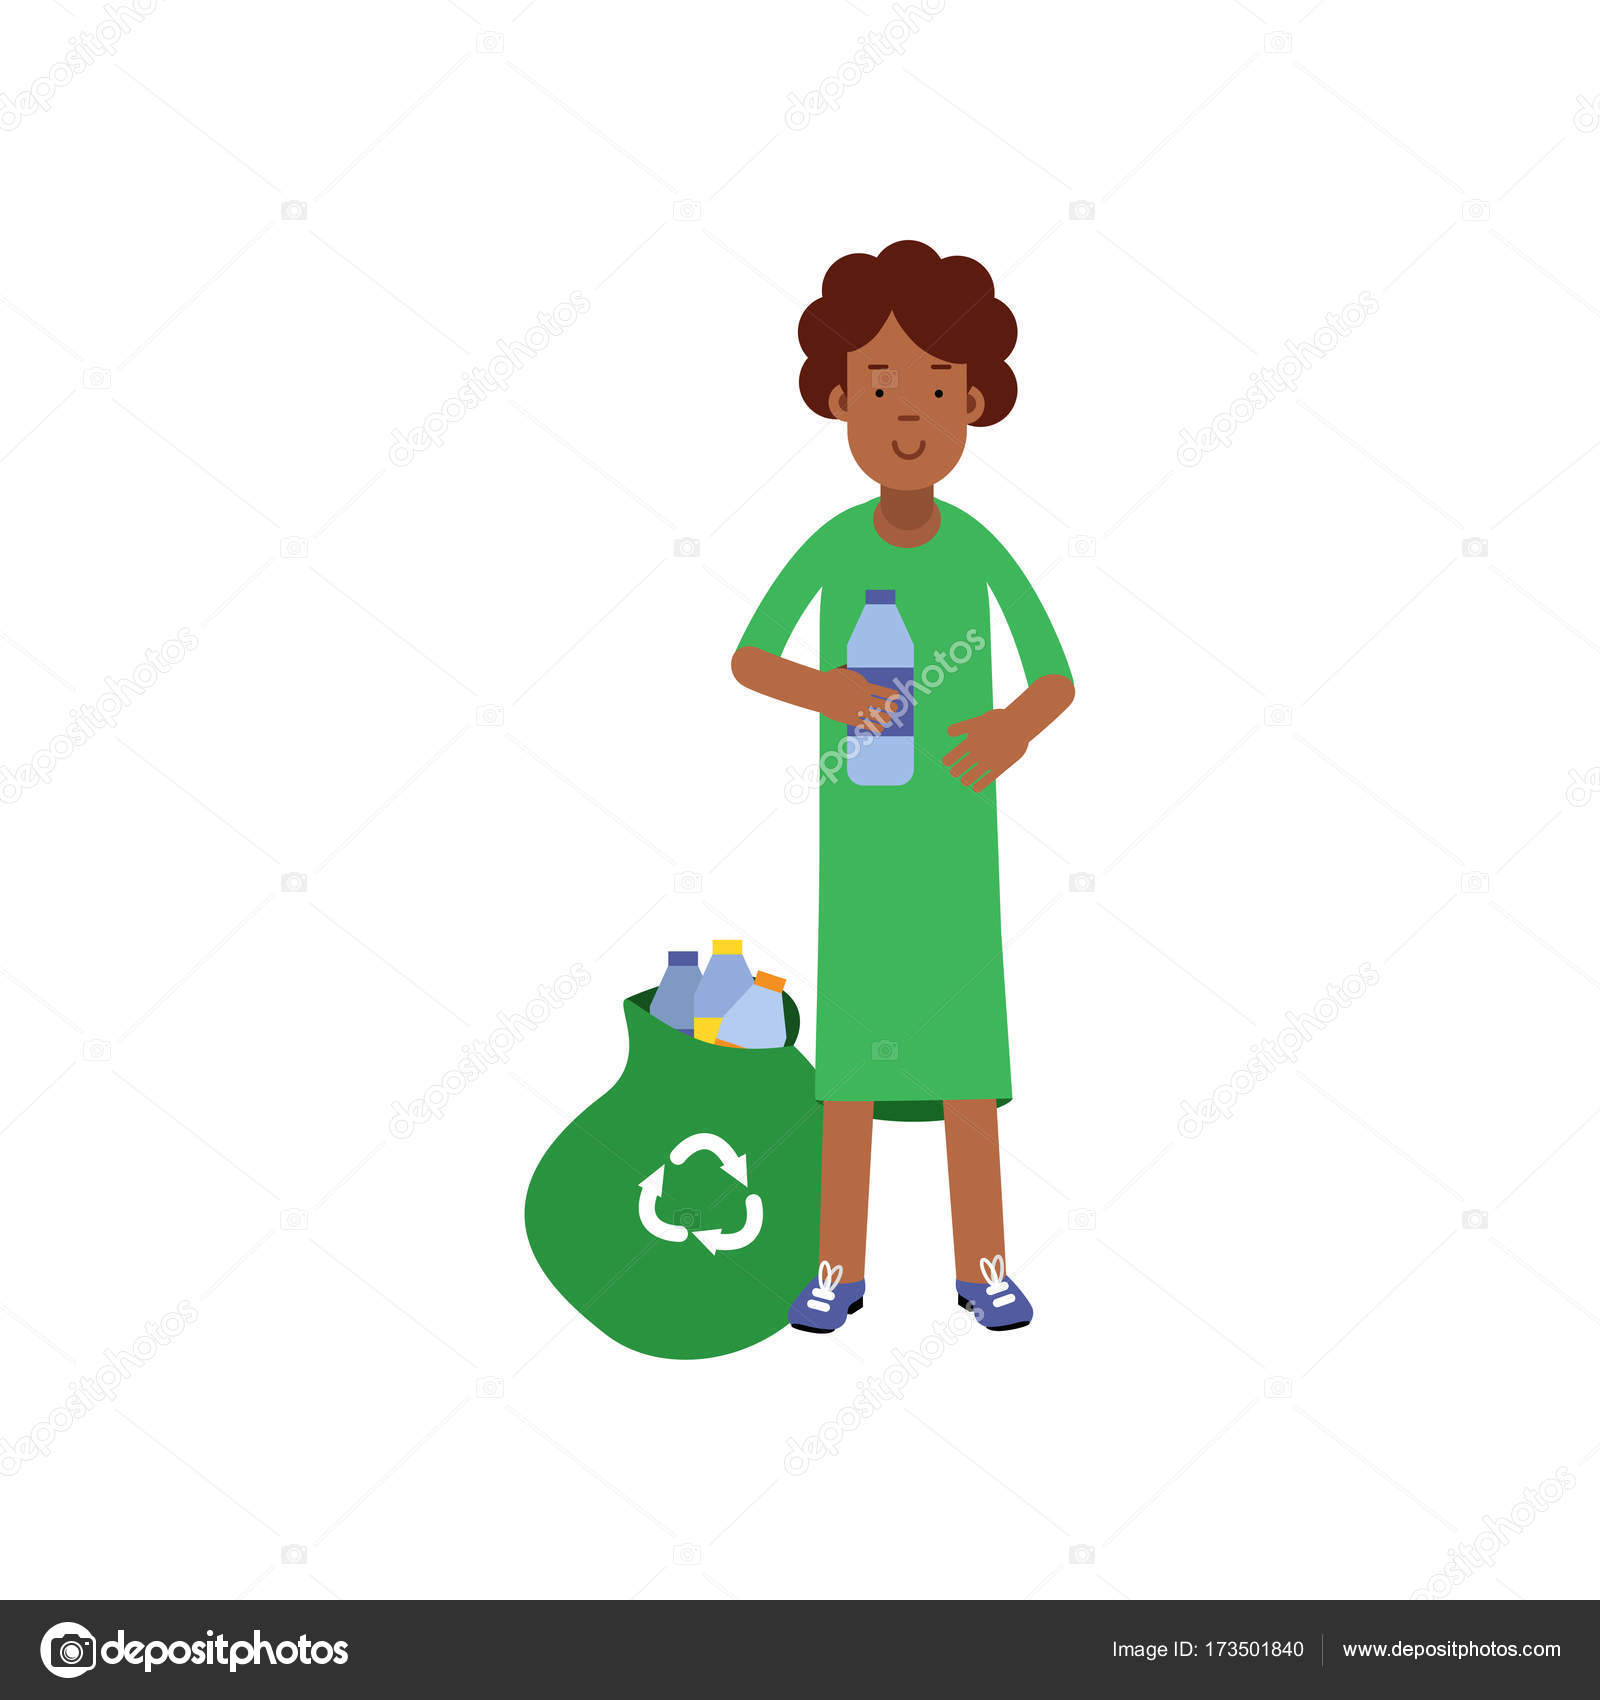 f25192b014 Γυναίκα εθελοντής κινούμενα σχέδια χαρακτήρα που συλλέγει πλαστικά  μπουκάλια στην τσάντα για ανακύκλωση